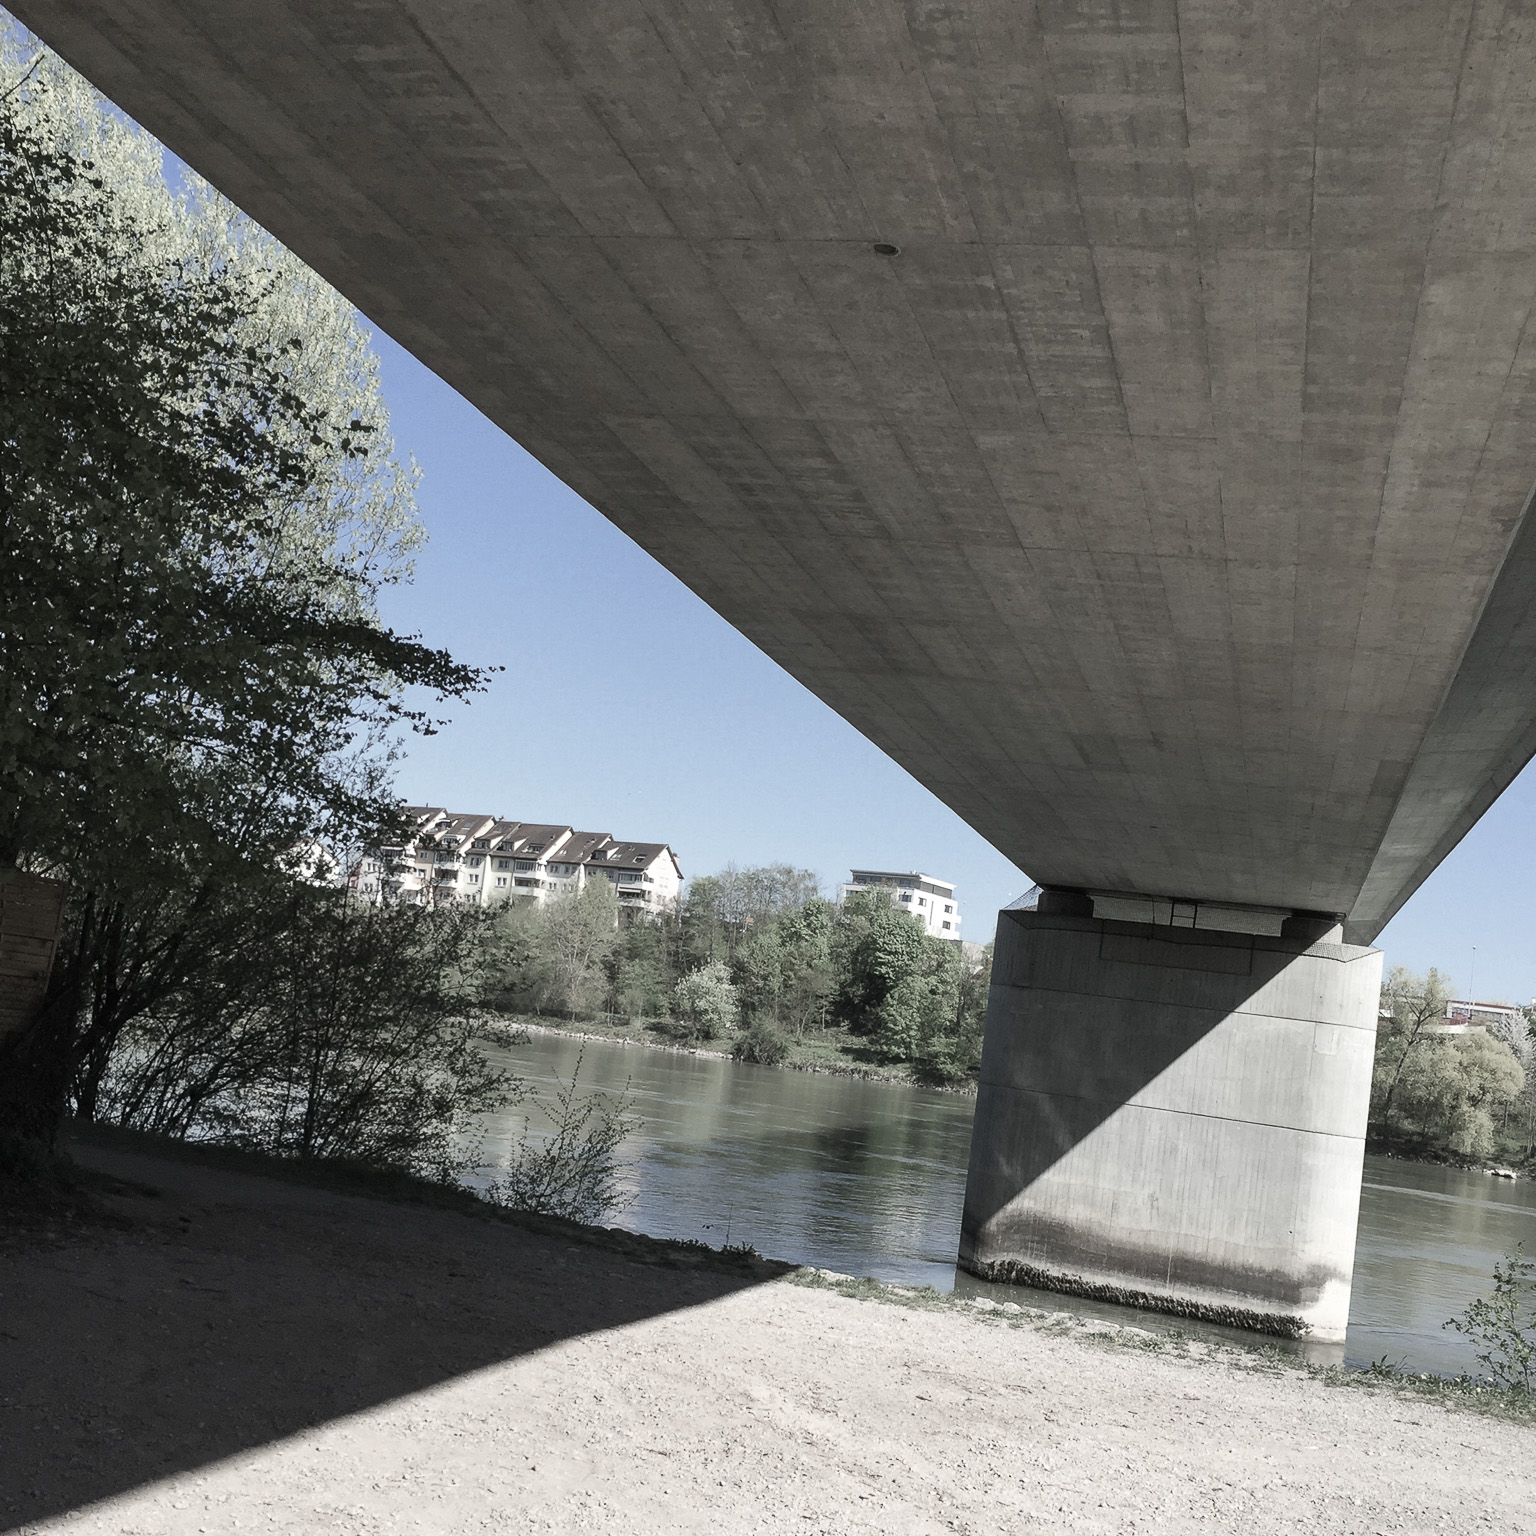 14-Rhein-0129-P-1504.jpg